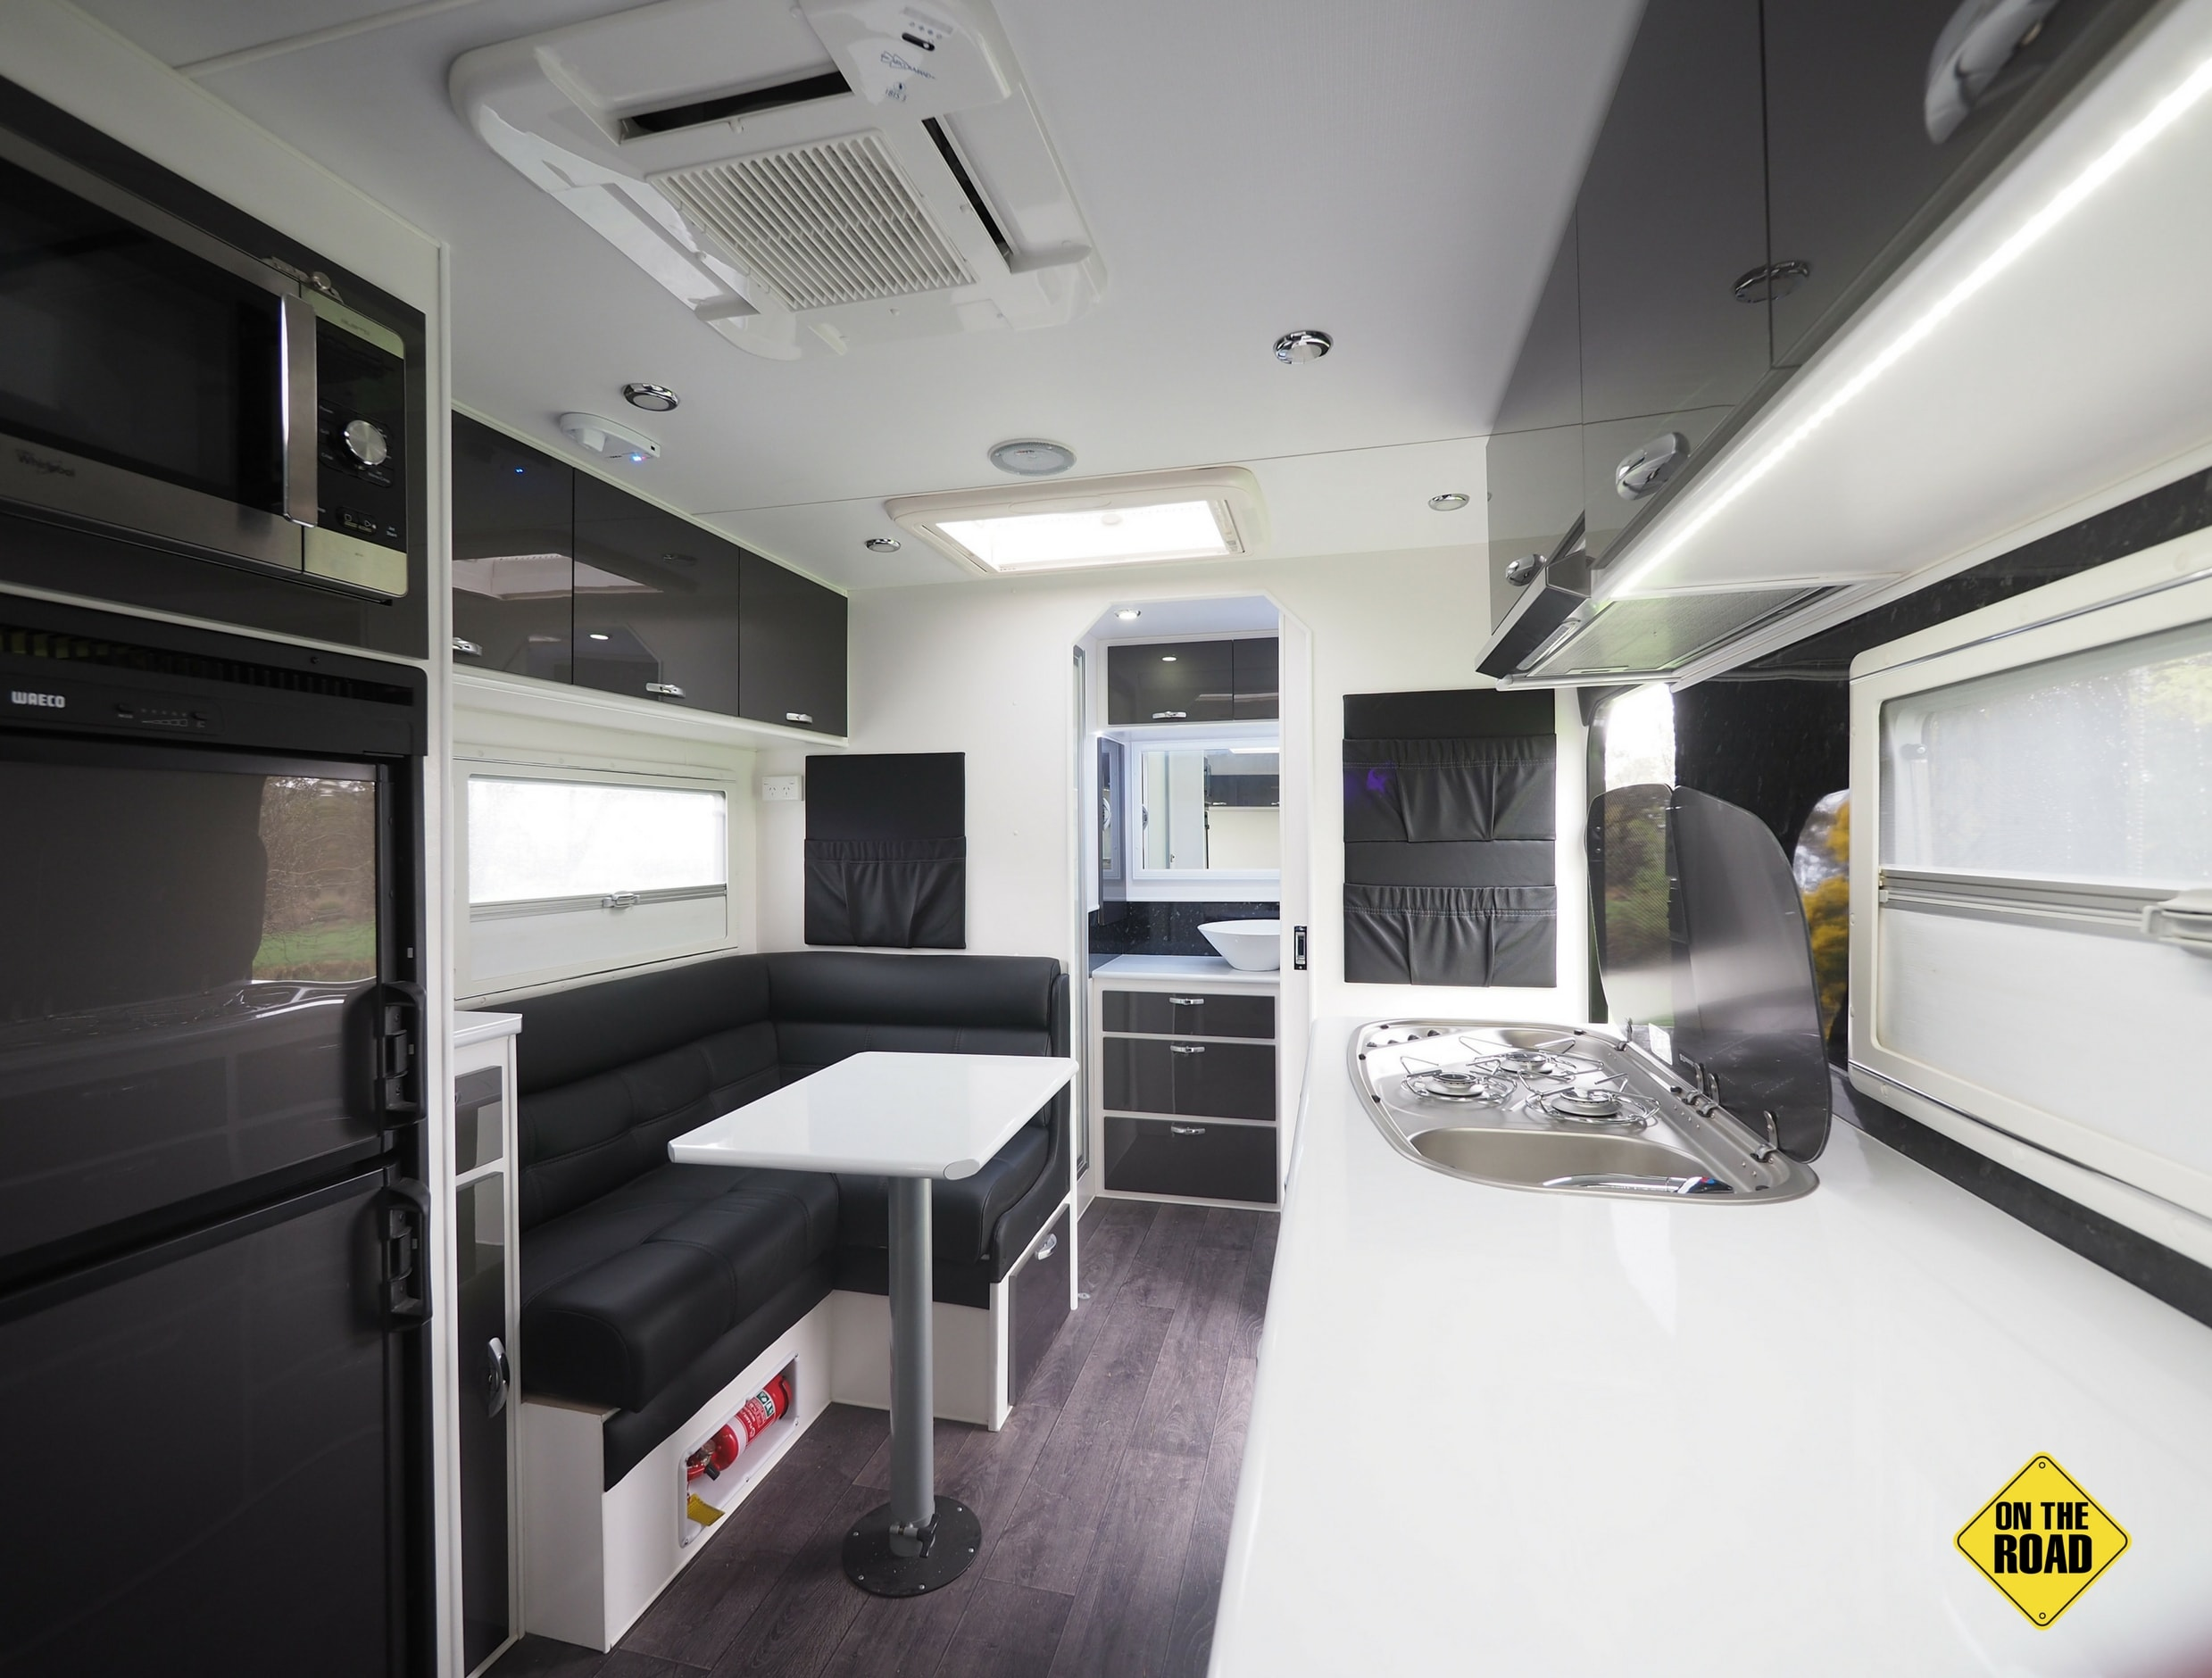 Bushmaster Ironbark kitchenette interior